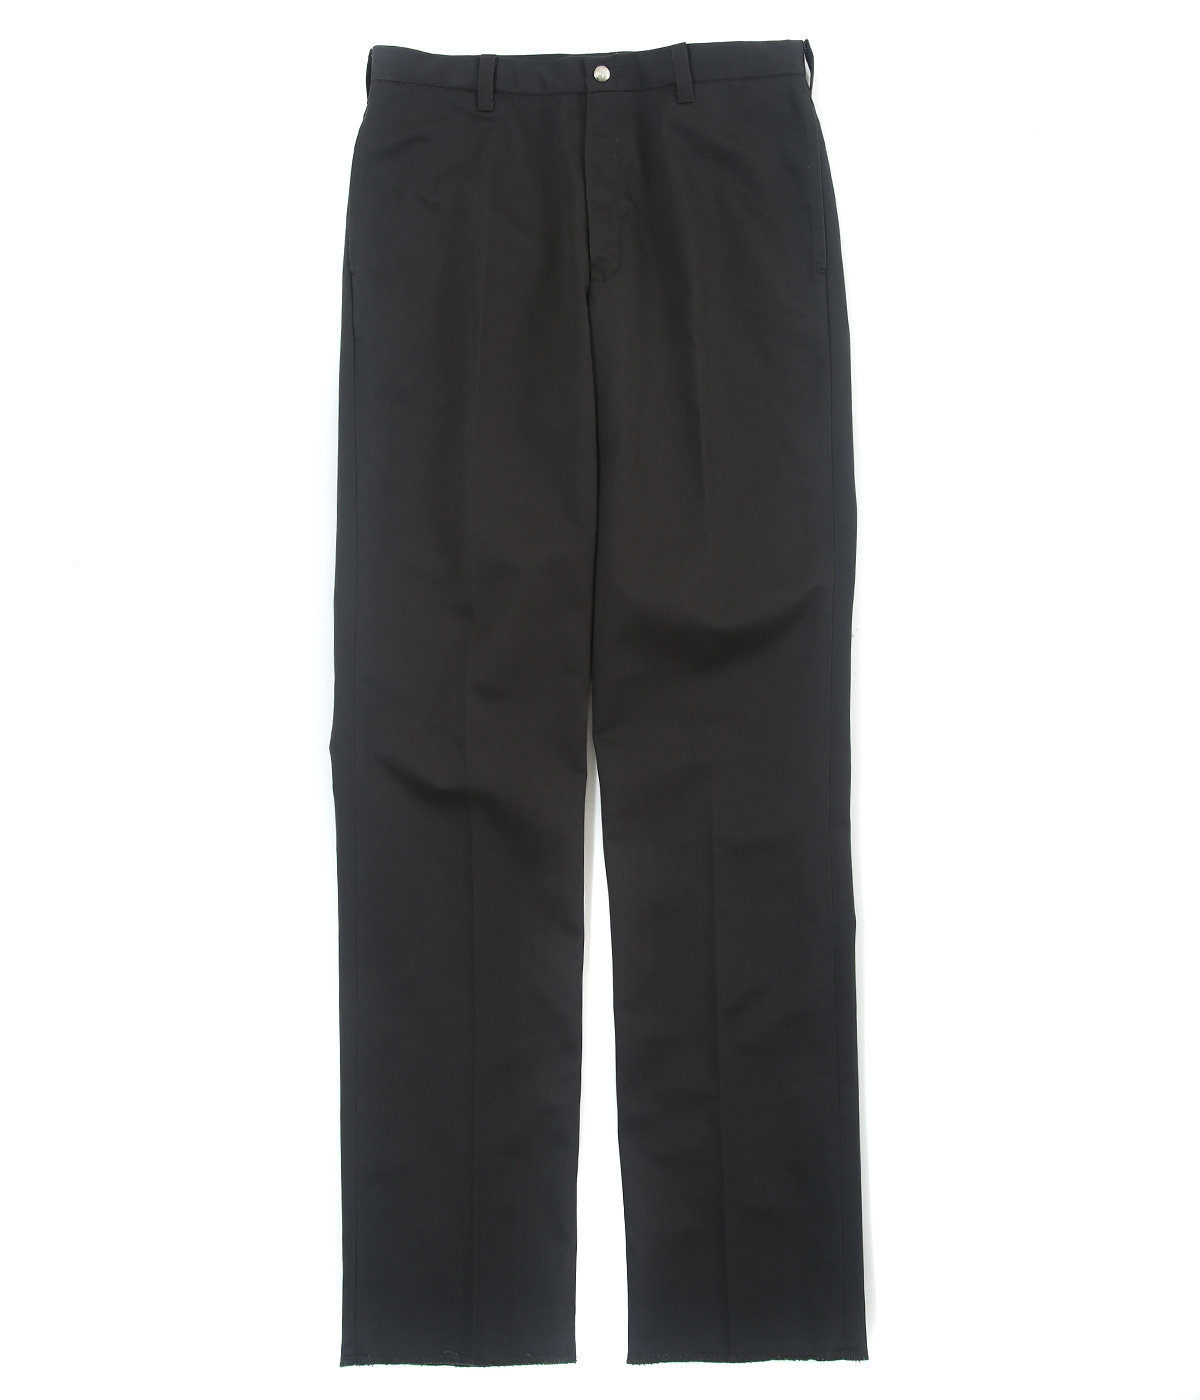 T/C HOPSACK PANTS